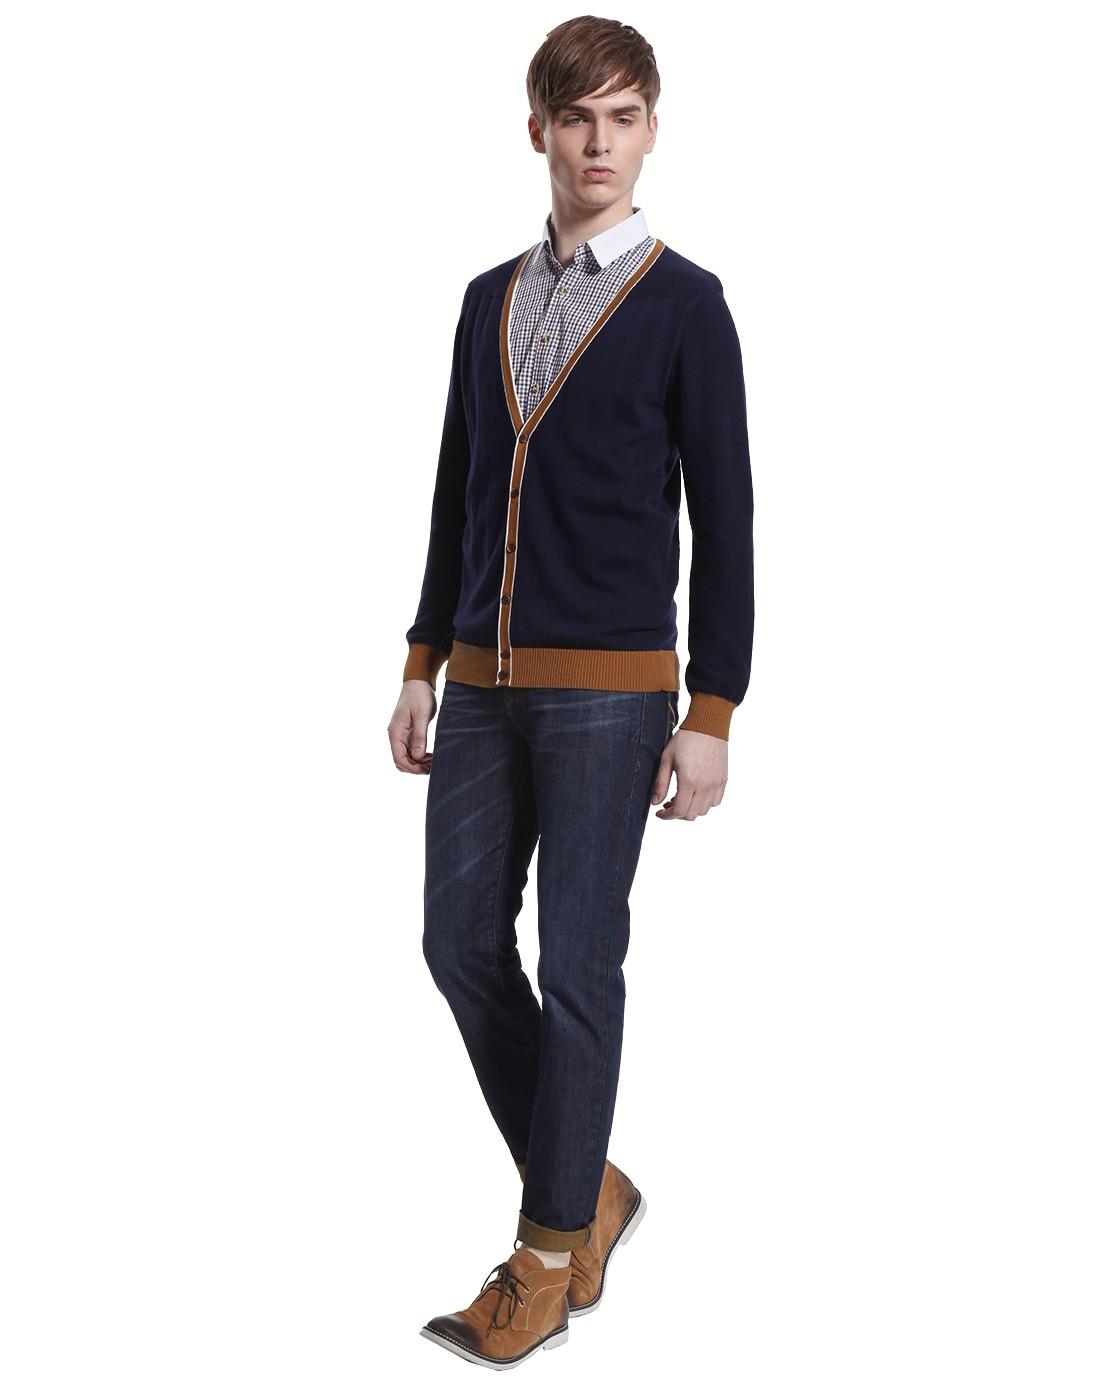 konzen男款宝蓝衬衣领假两件针织衫1331711954_唯品会